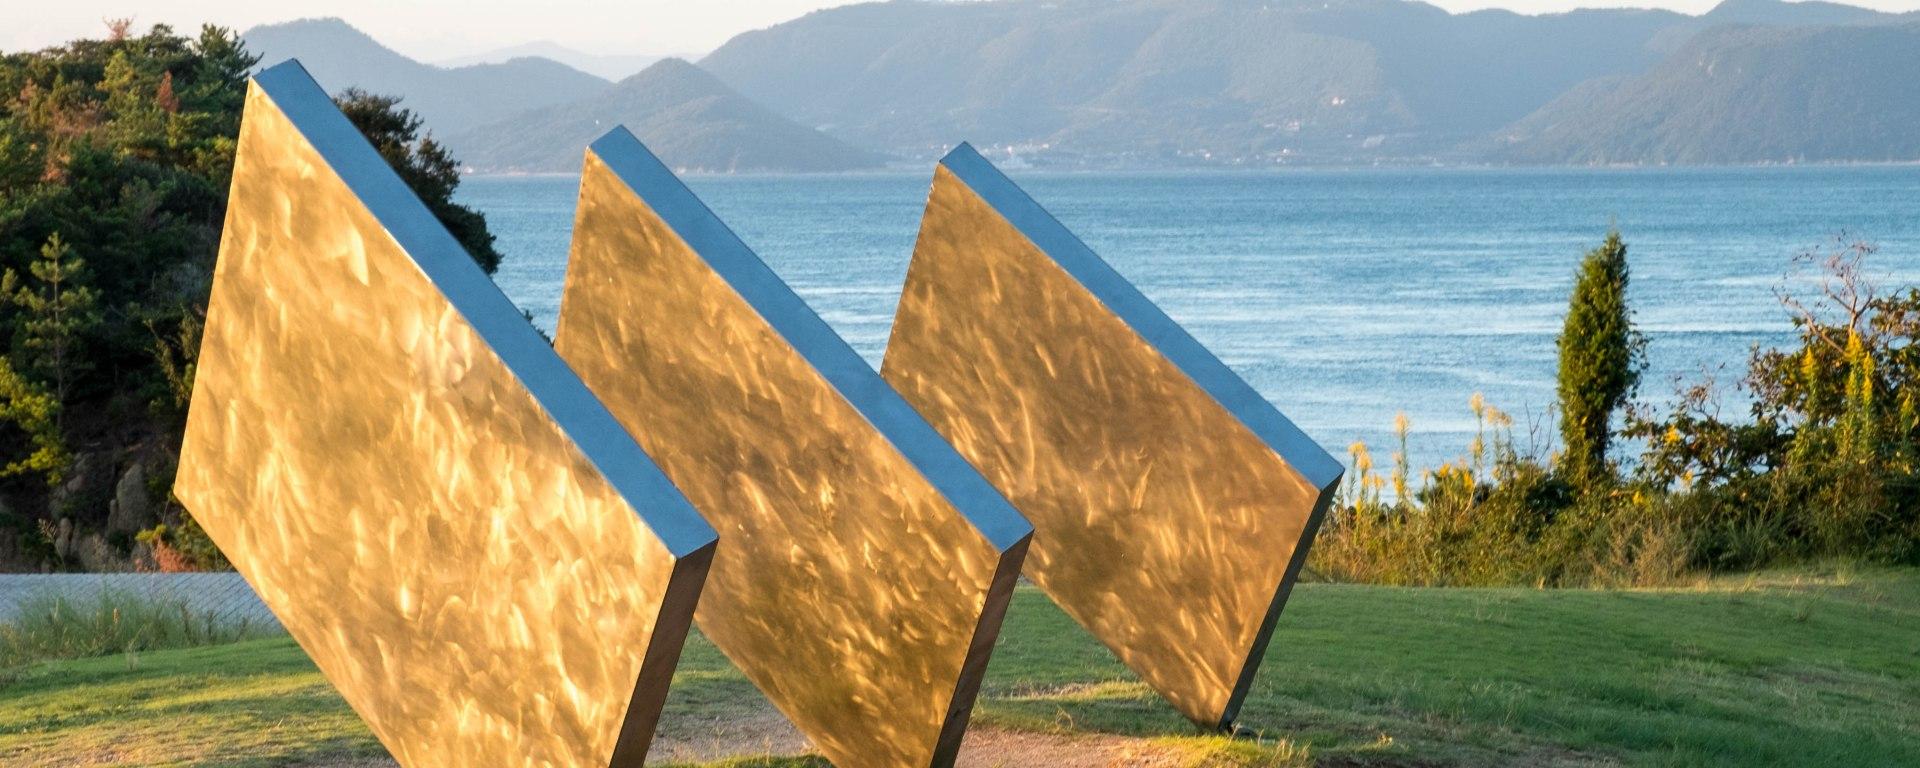 George Rickey Three Squares Vertical Diagonal 1972-82